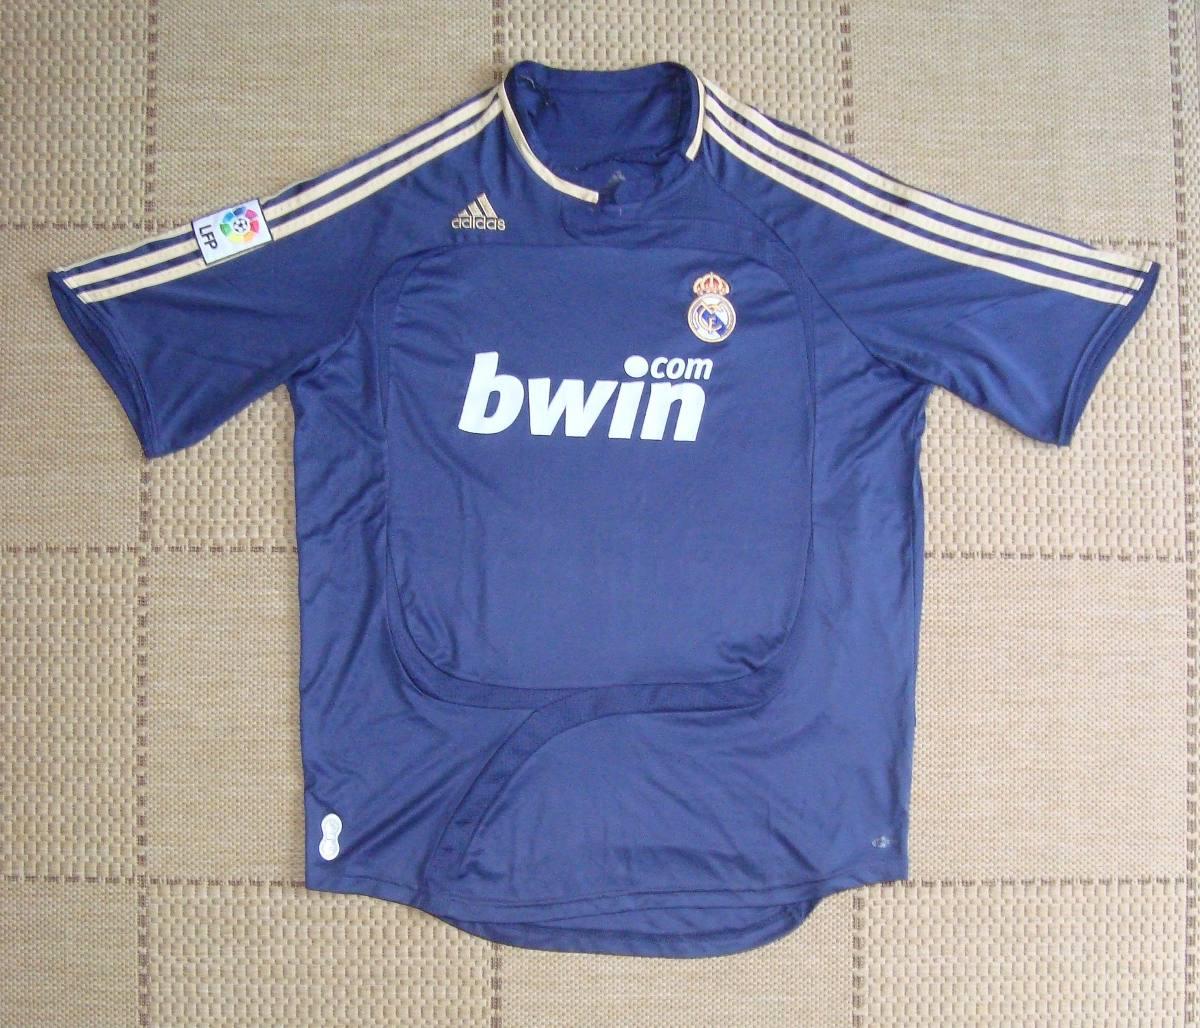 camisa original real madrid 2007 2008 away. Carregando zoom. cf578dfcc9a7d